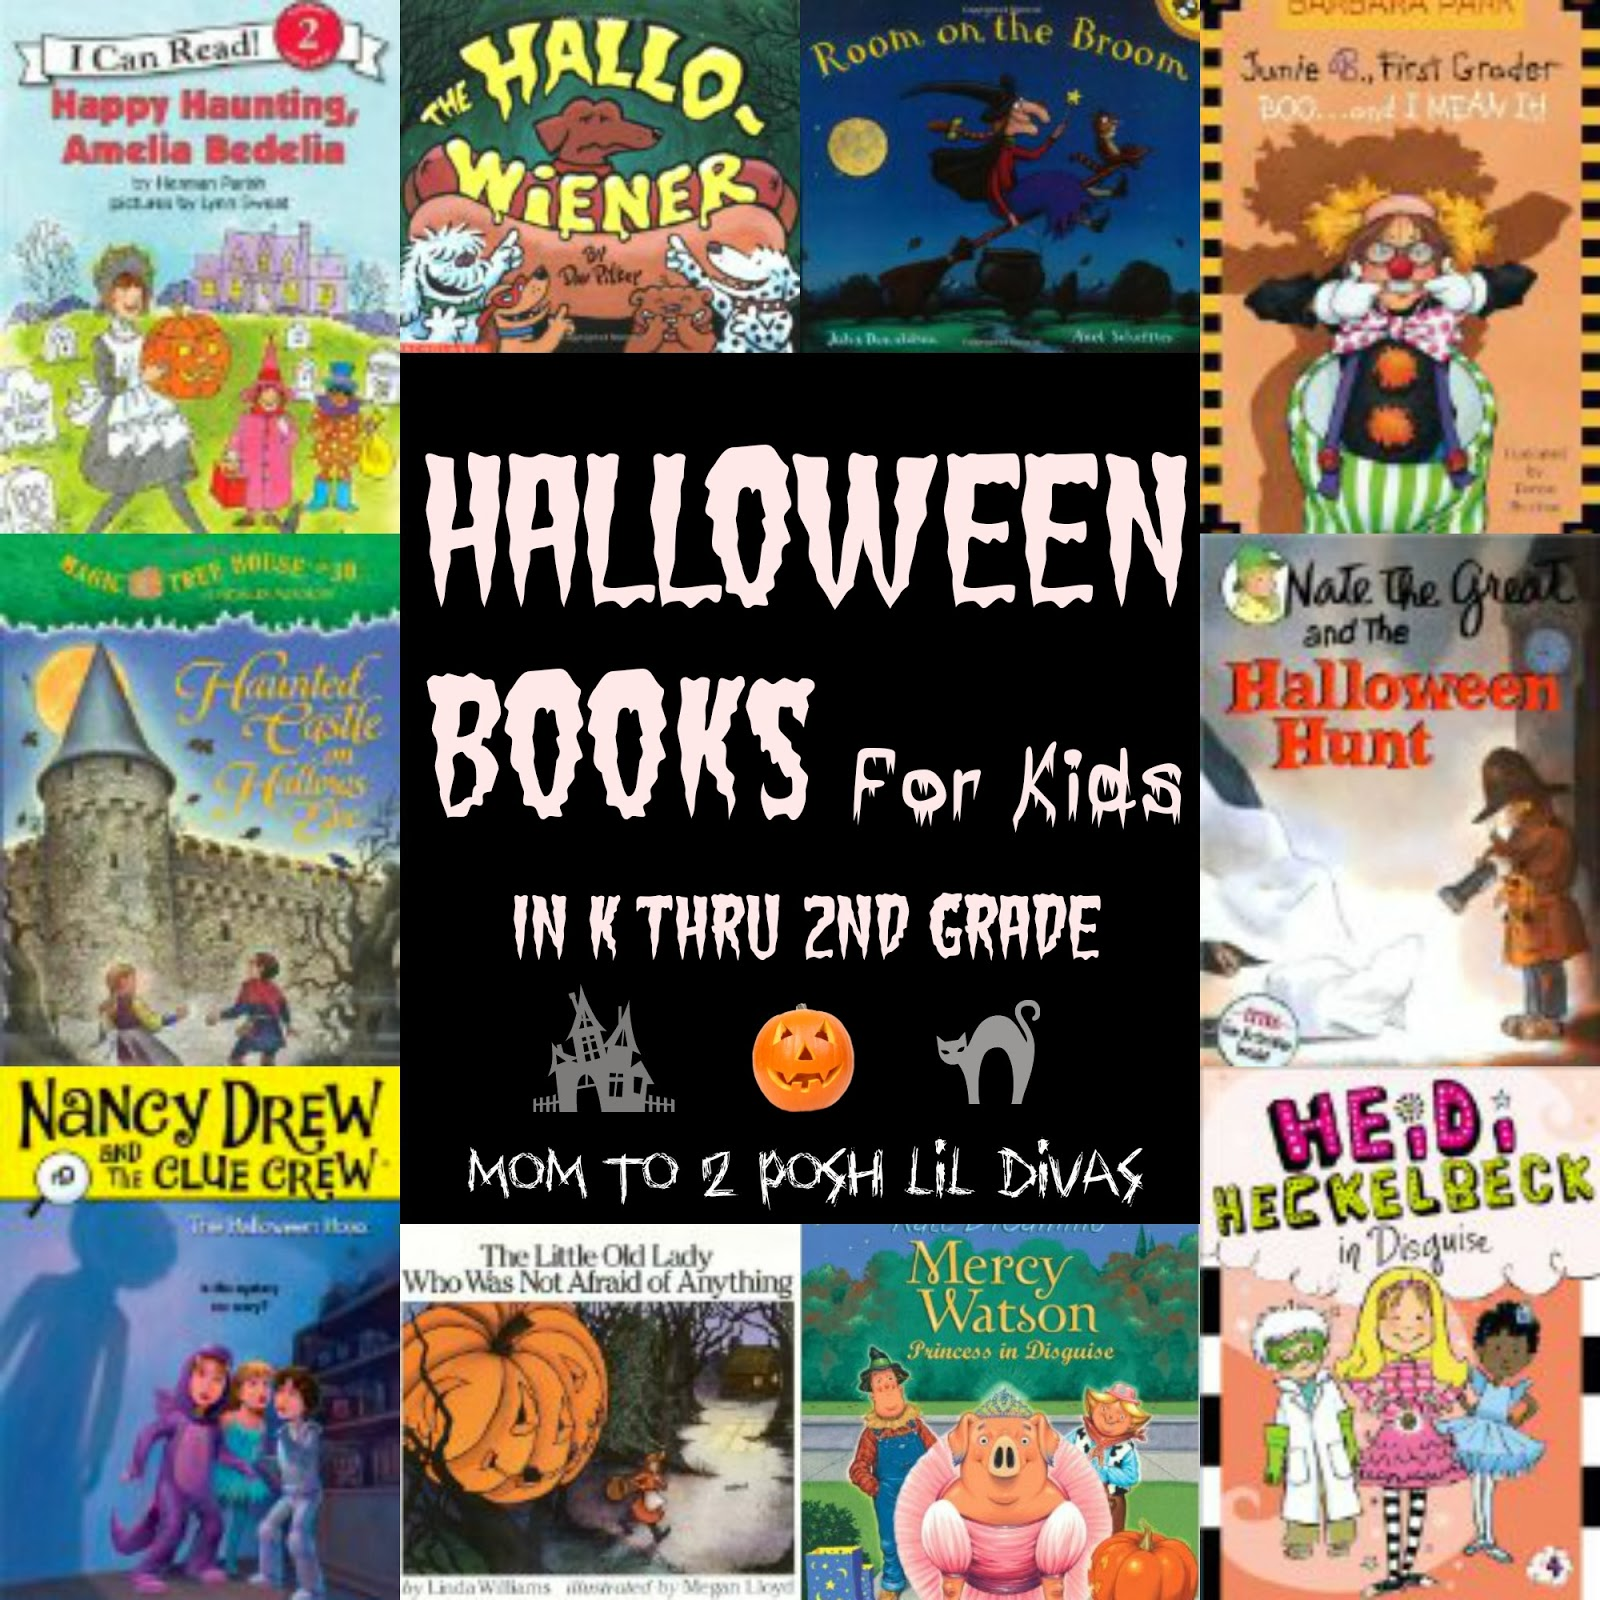 Mom to 2 Posh Lil Divas: Halloween Books for K thru 2nd Graders